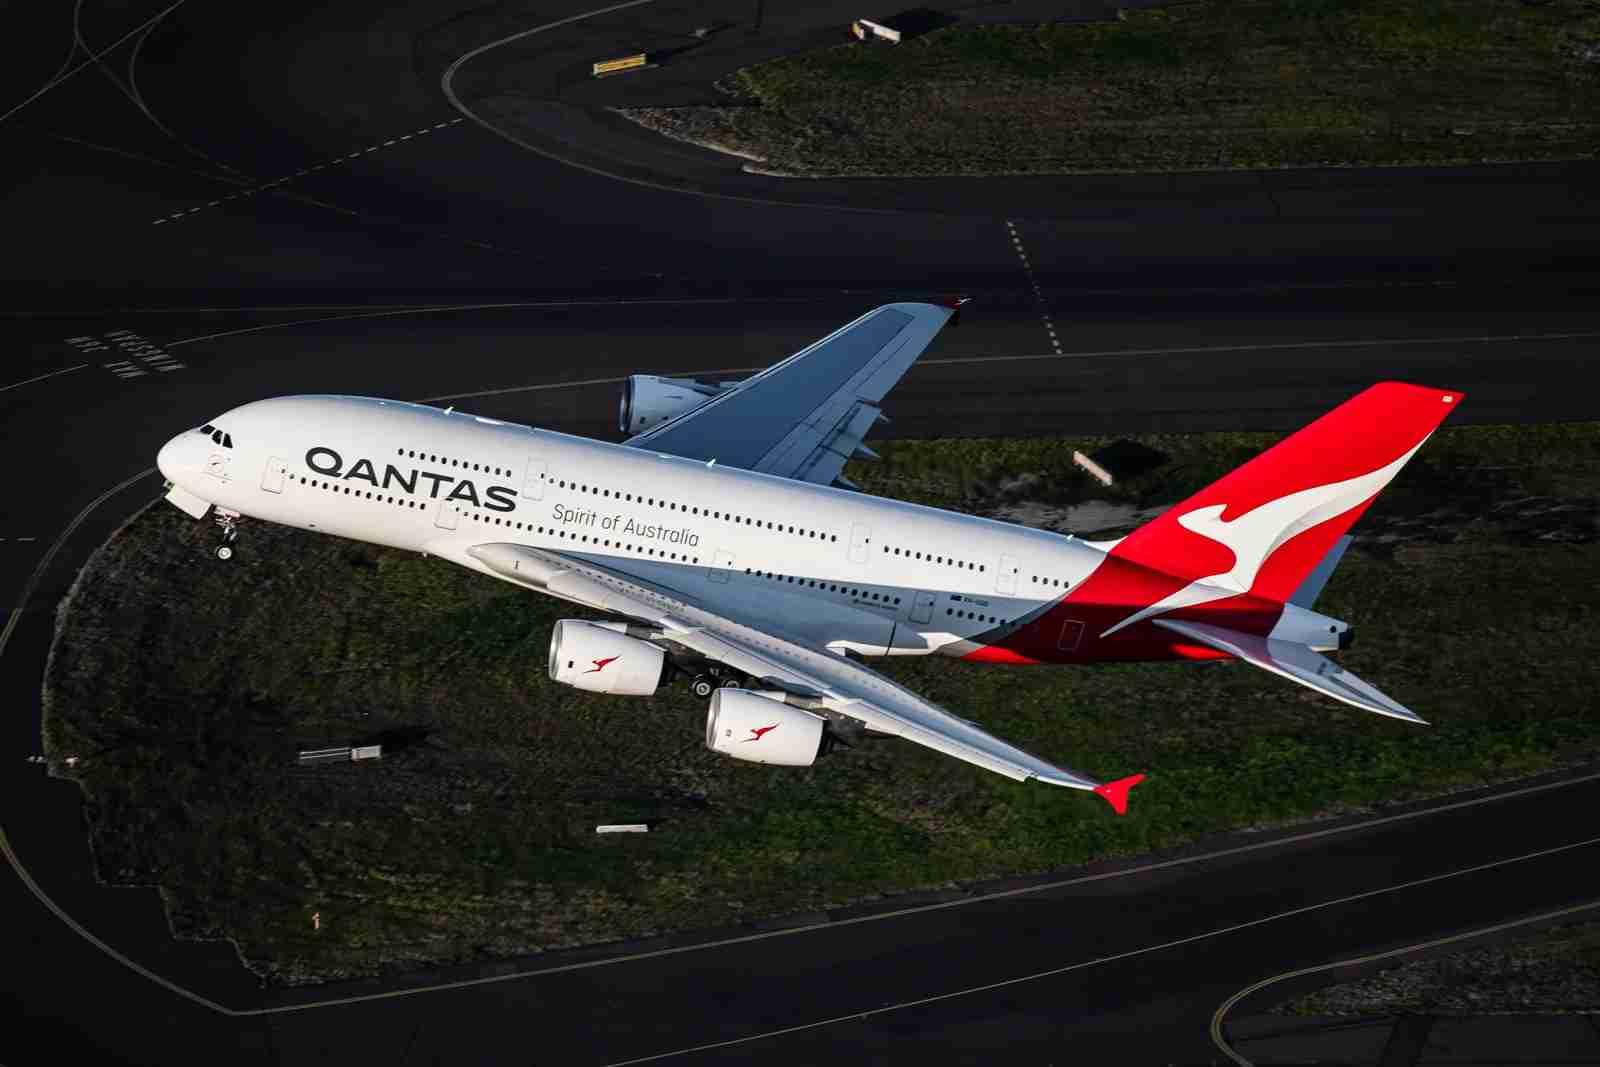 Qantas-A380-at-Sydney-Airport-SYD-4